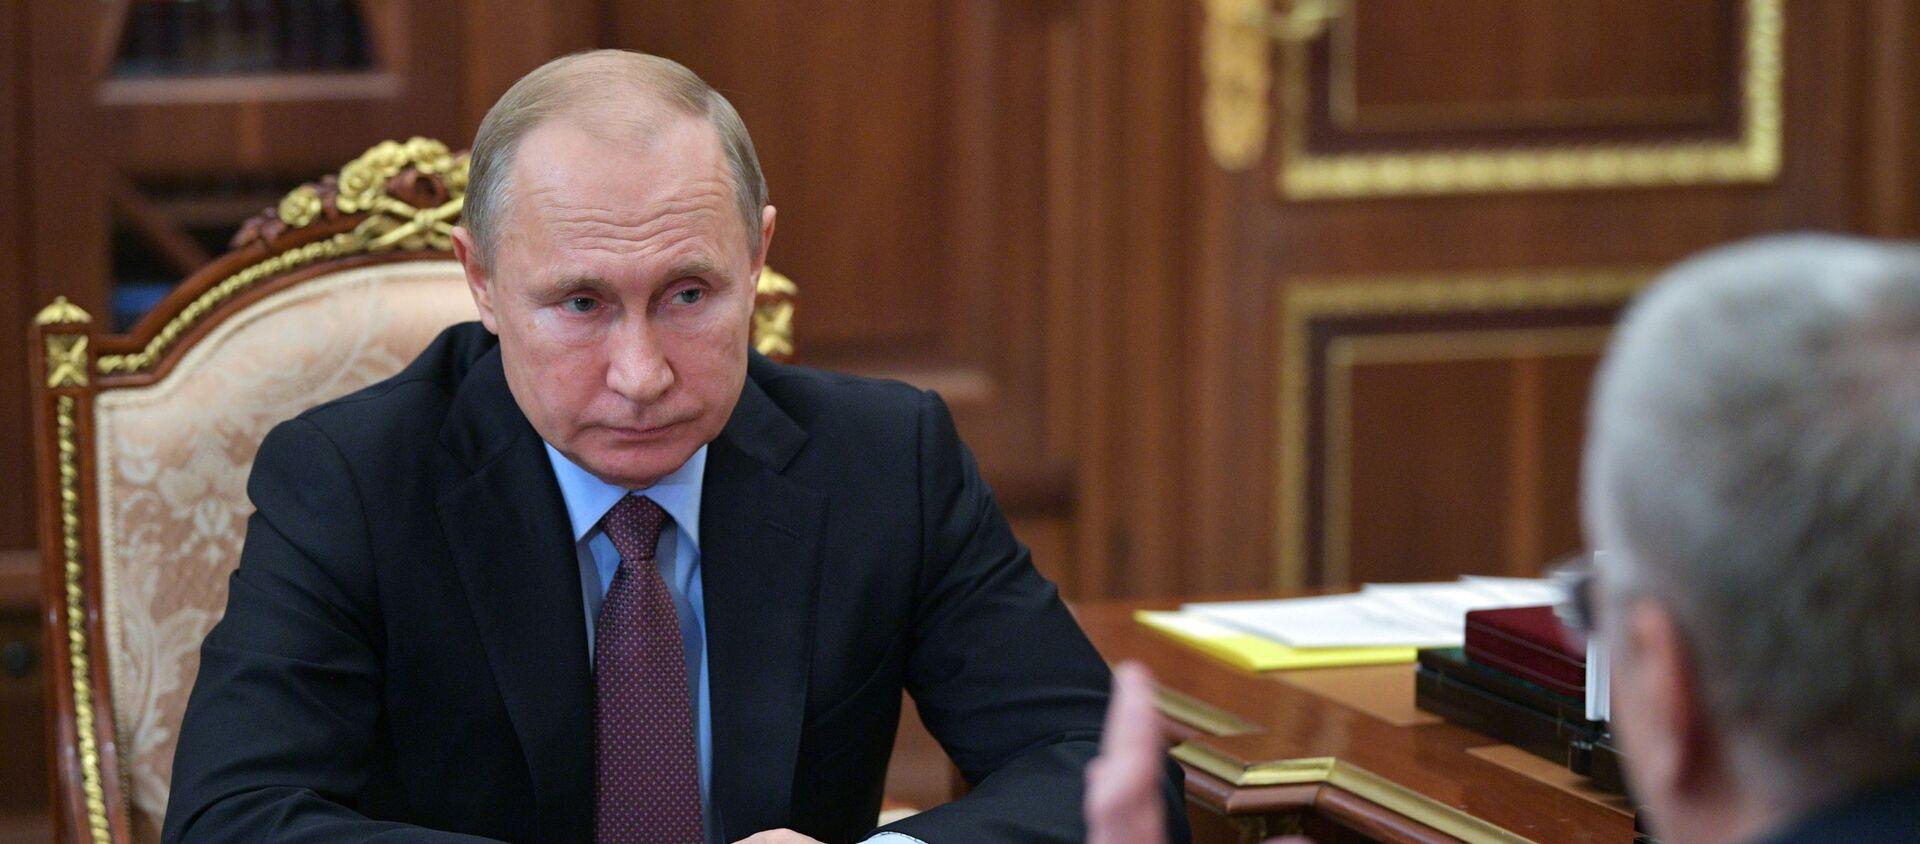 Владимир Путин во время встречи с Владимиром Жириновским - Sputnik Армения, 1920, 17.02.2021